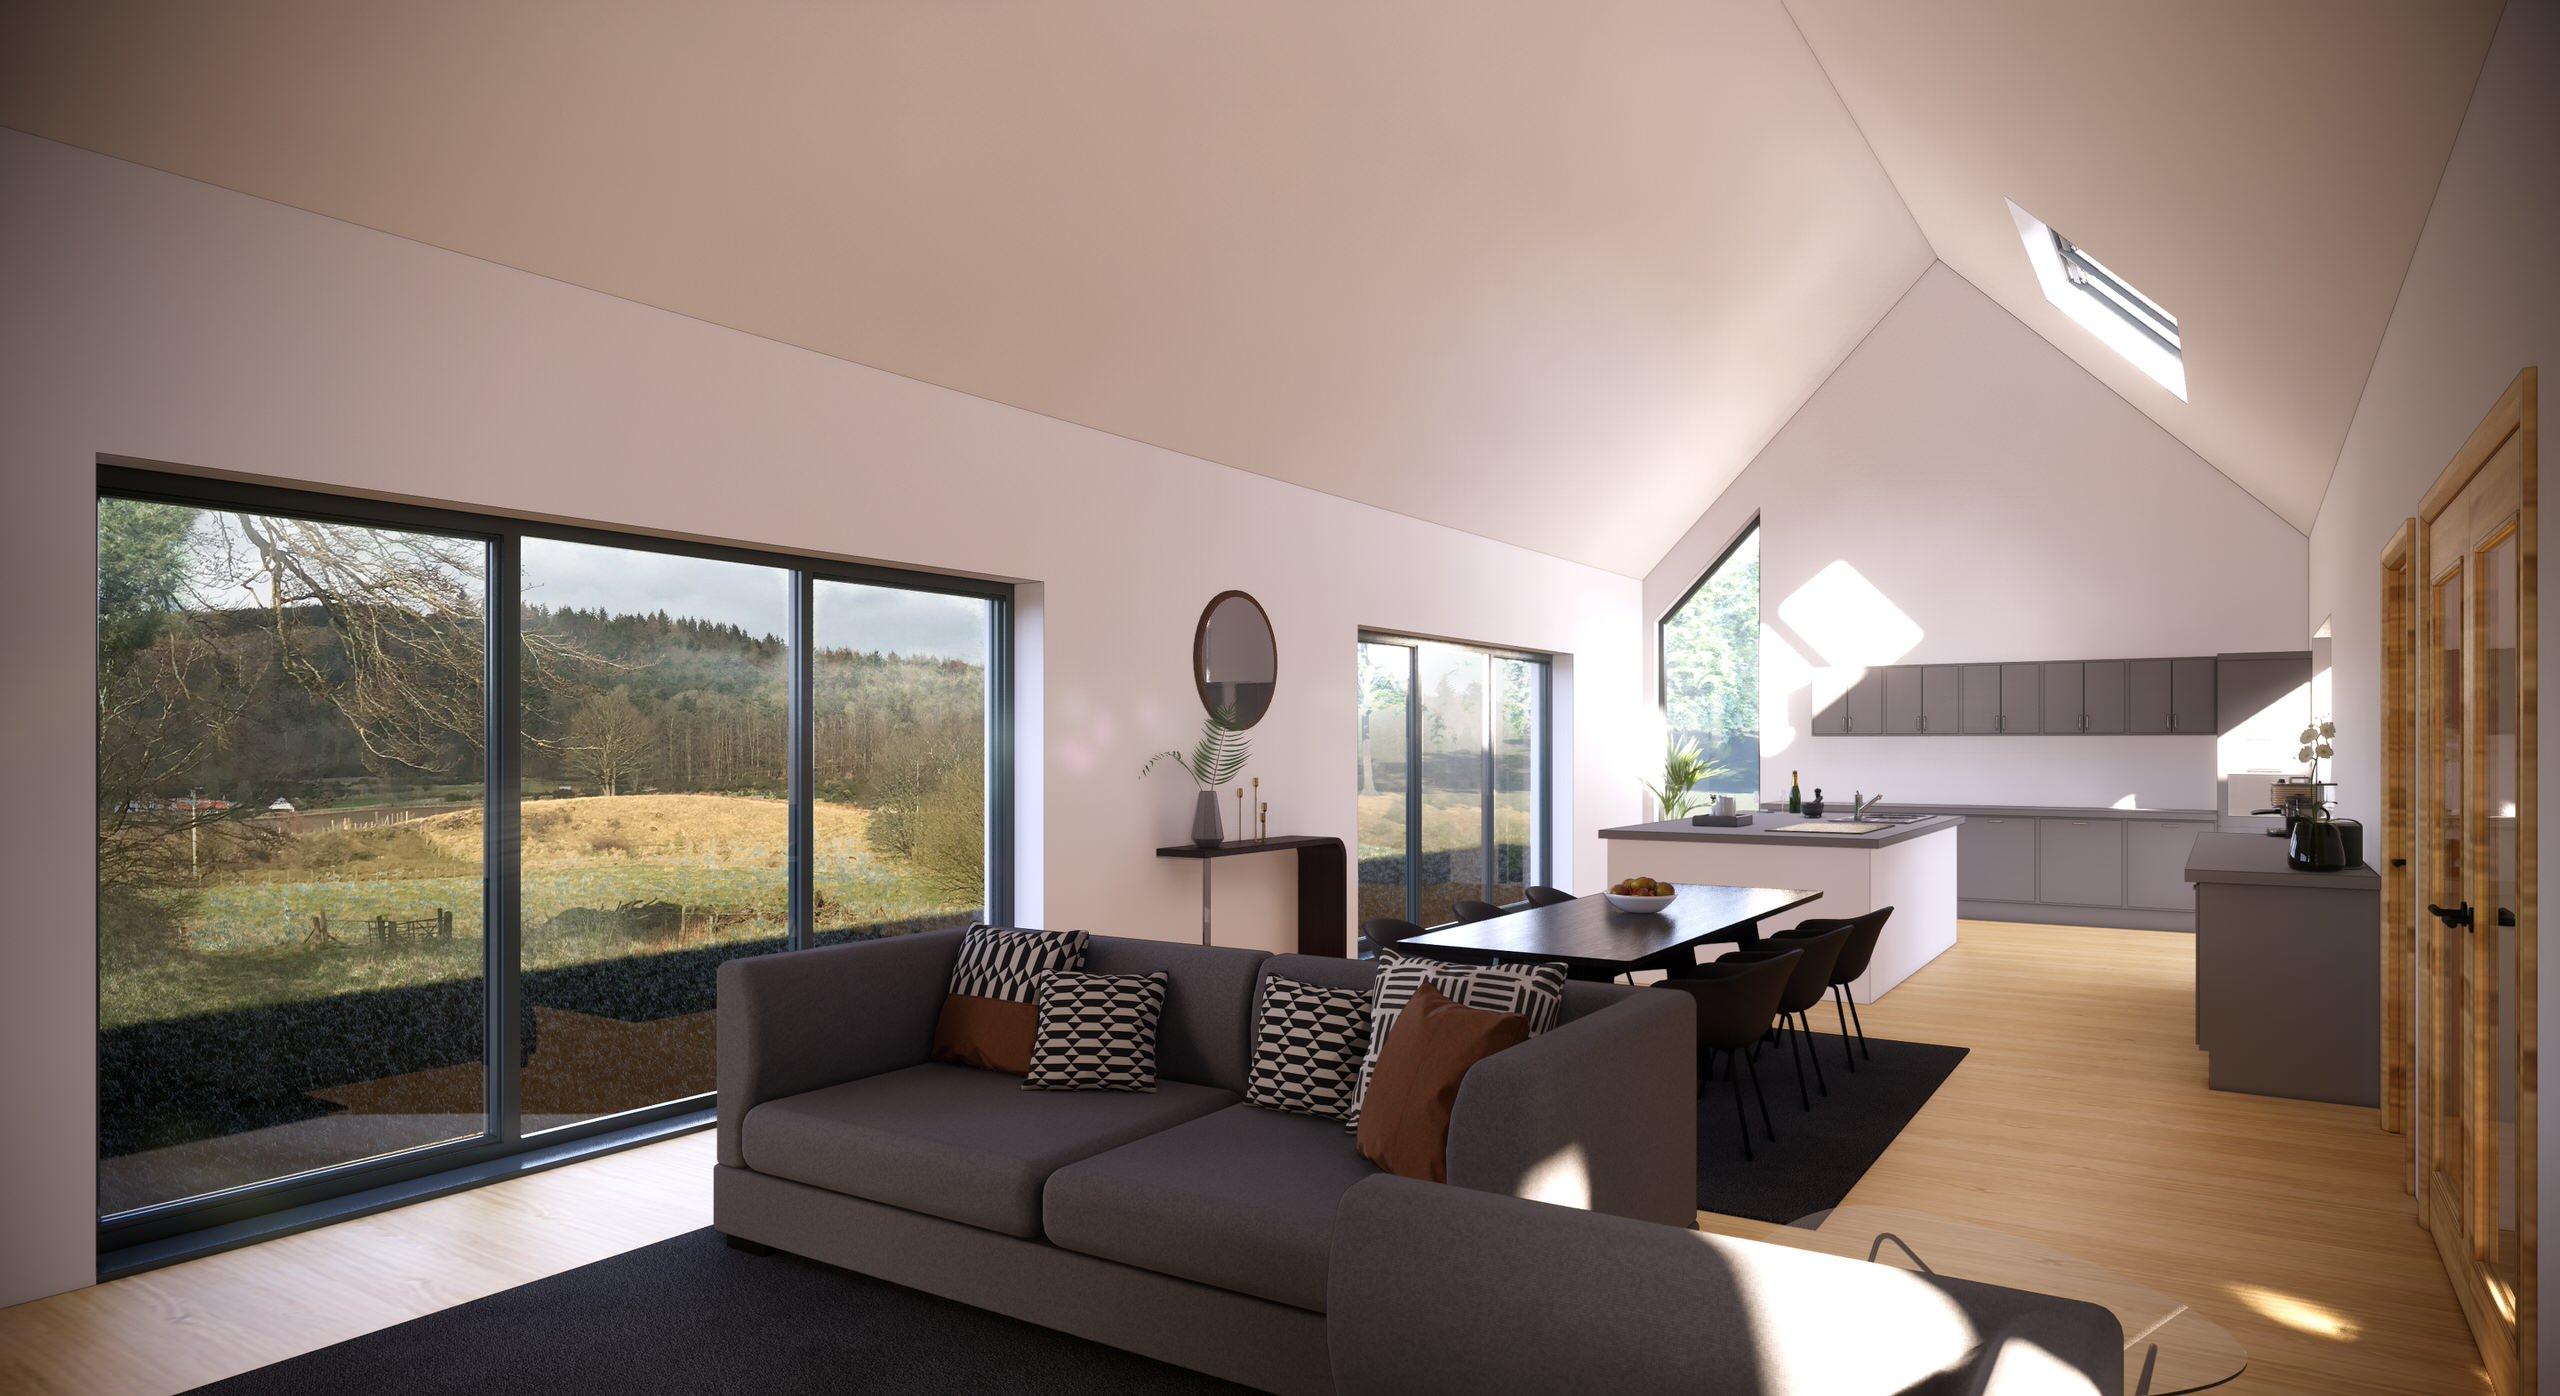 New Dwelling, Kinross